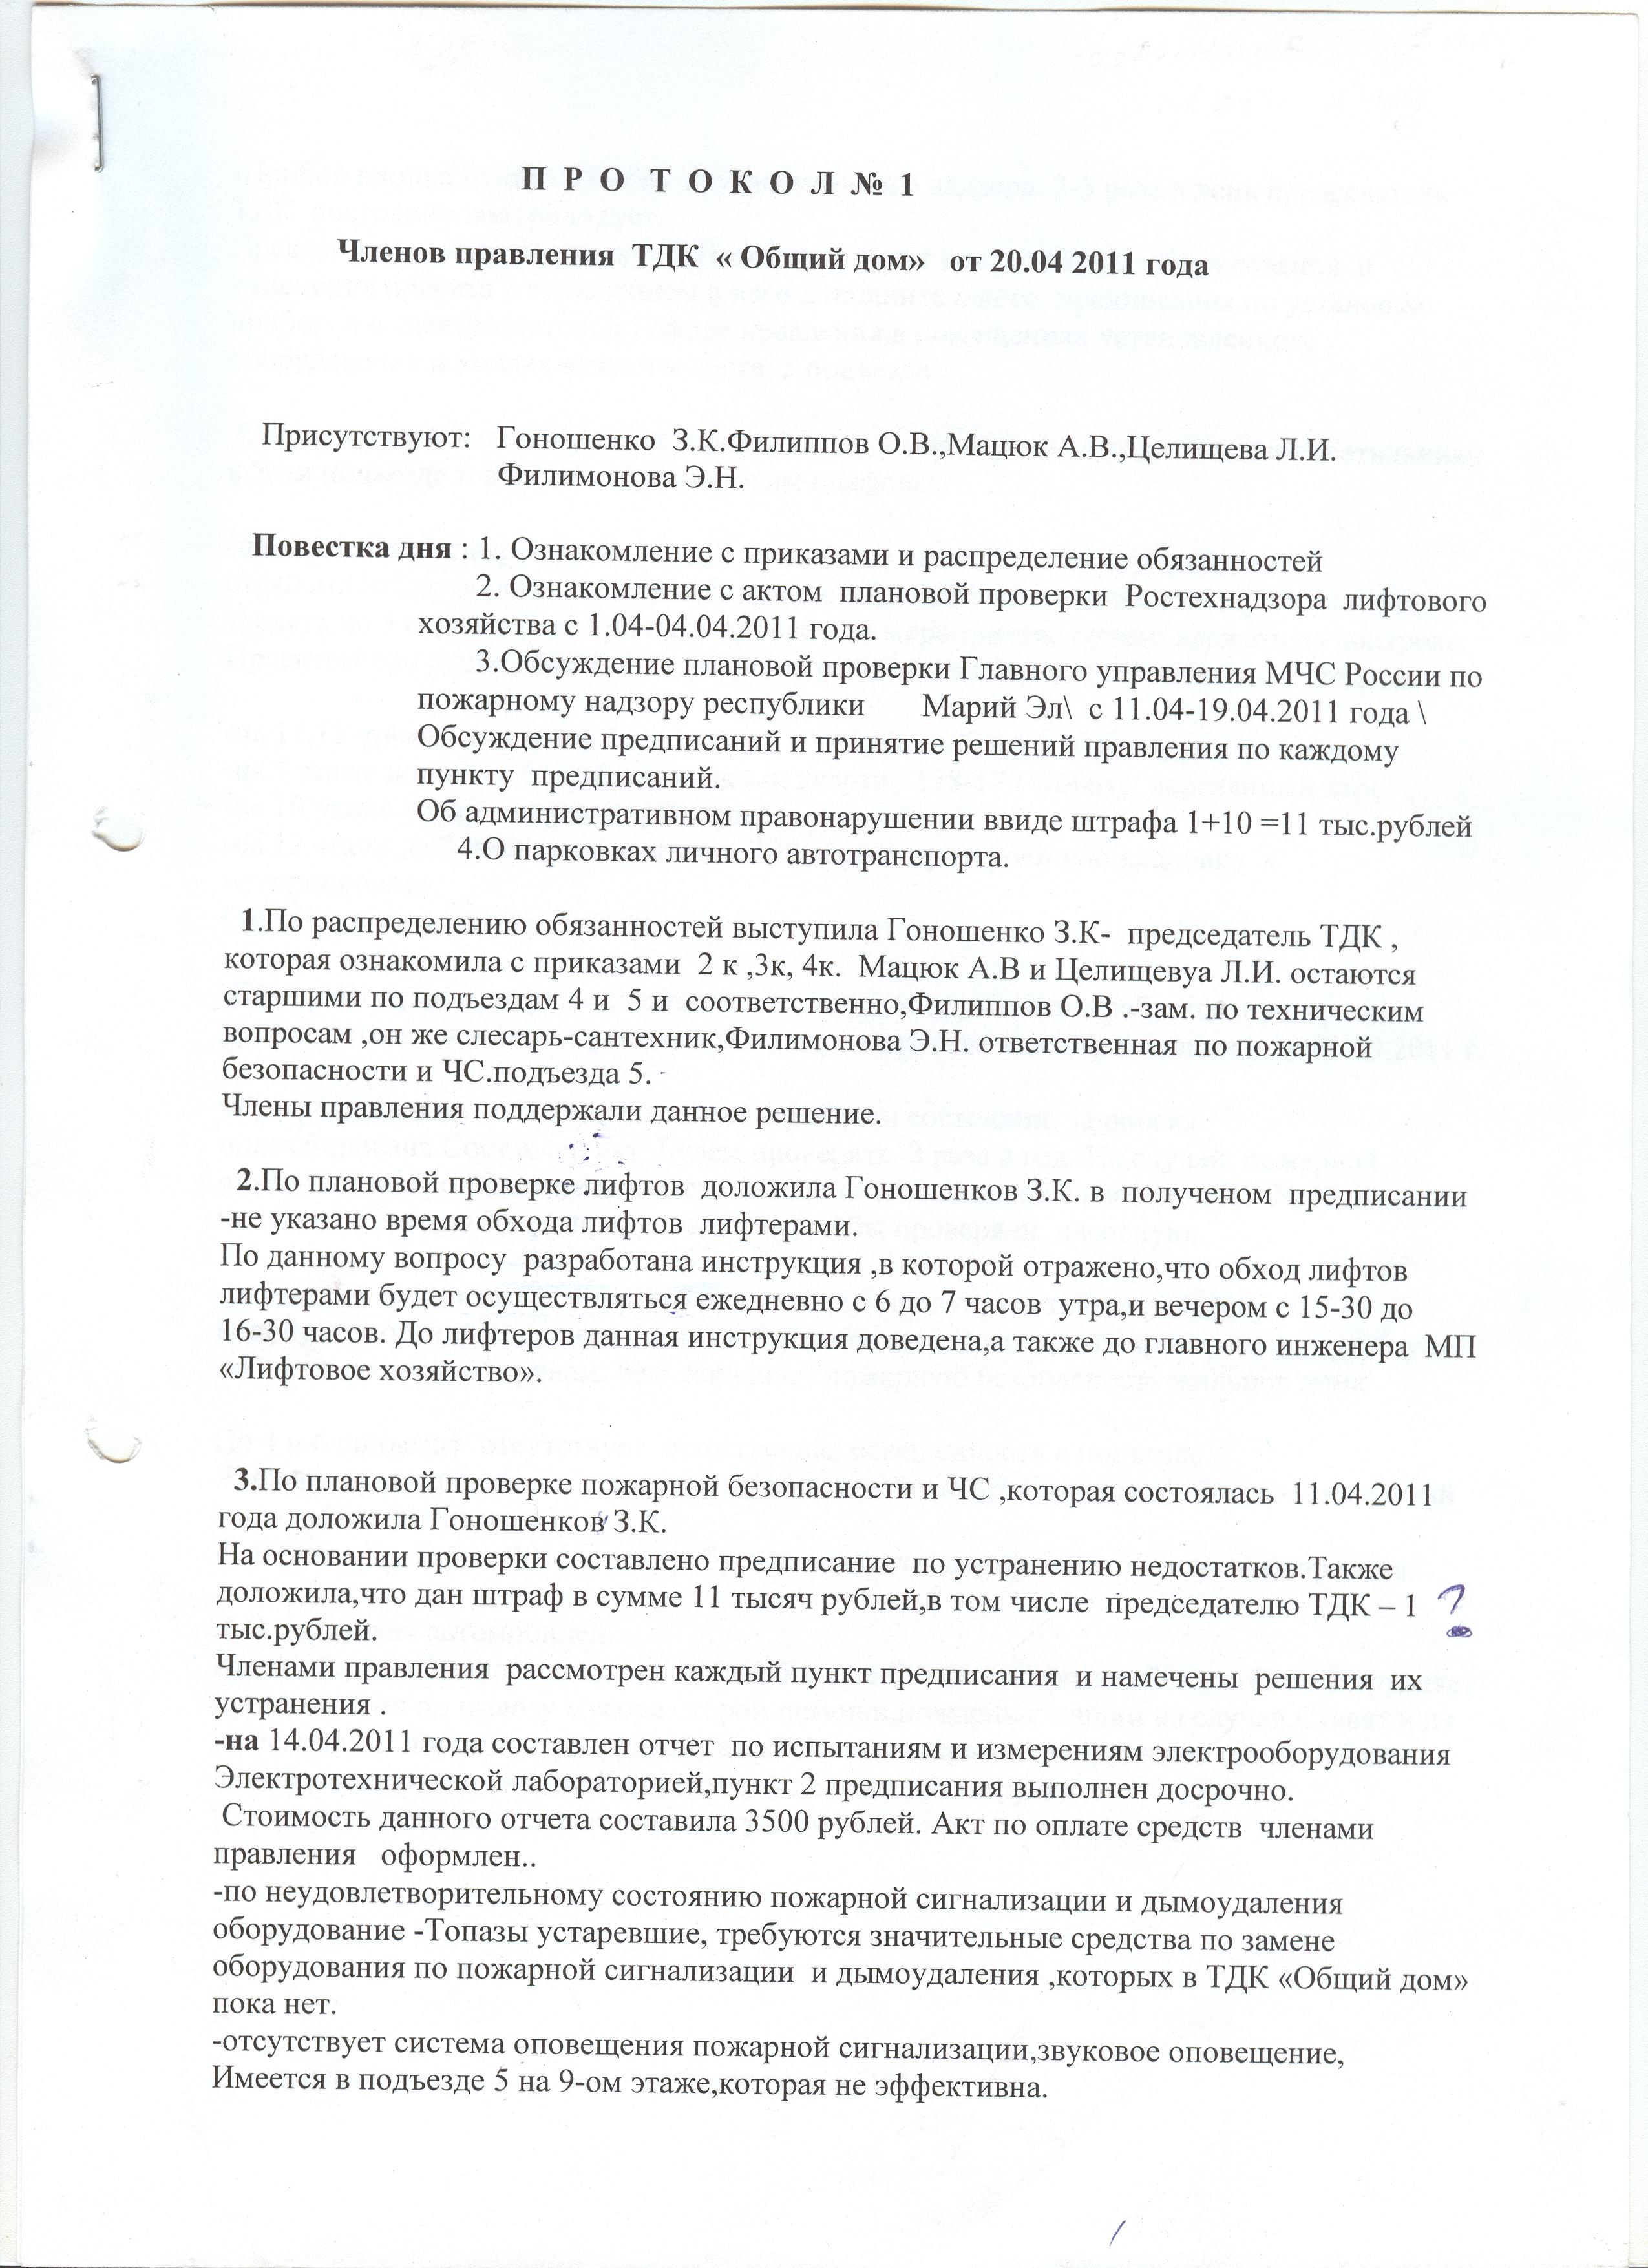 Minerva 01204-p1 - металлический форум